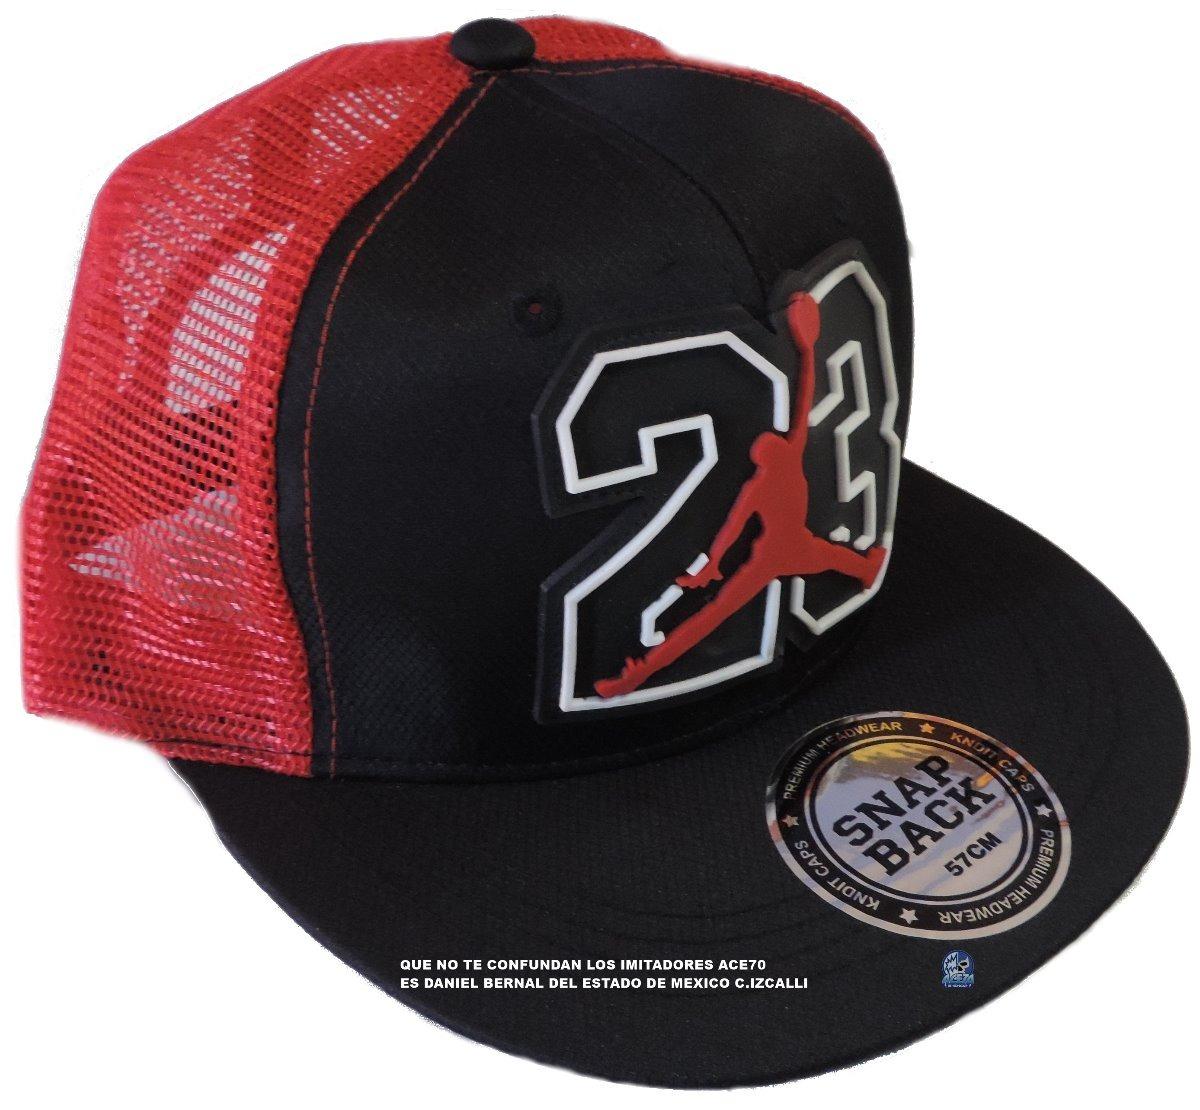 6ae234b453fc8 Chicago Bulls Gorra 23 Jordan Envio Gratis Nba1 Ace70 -   200.00 en ...